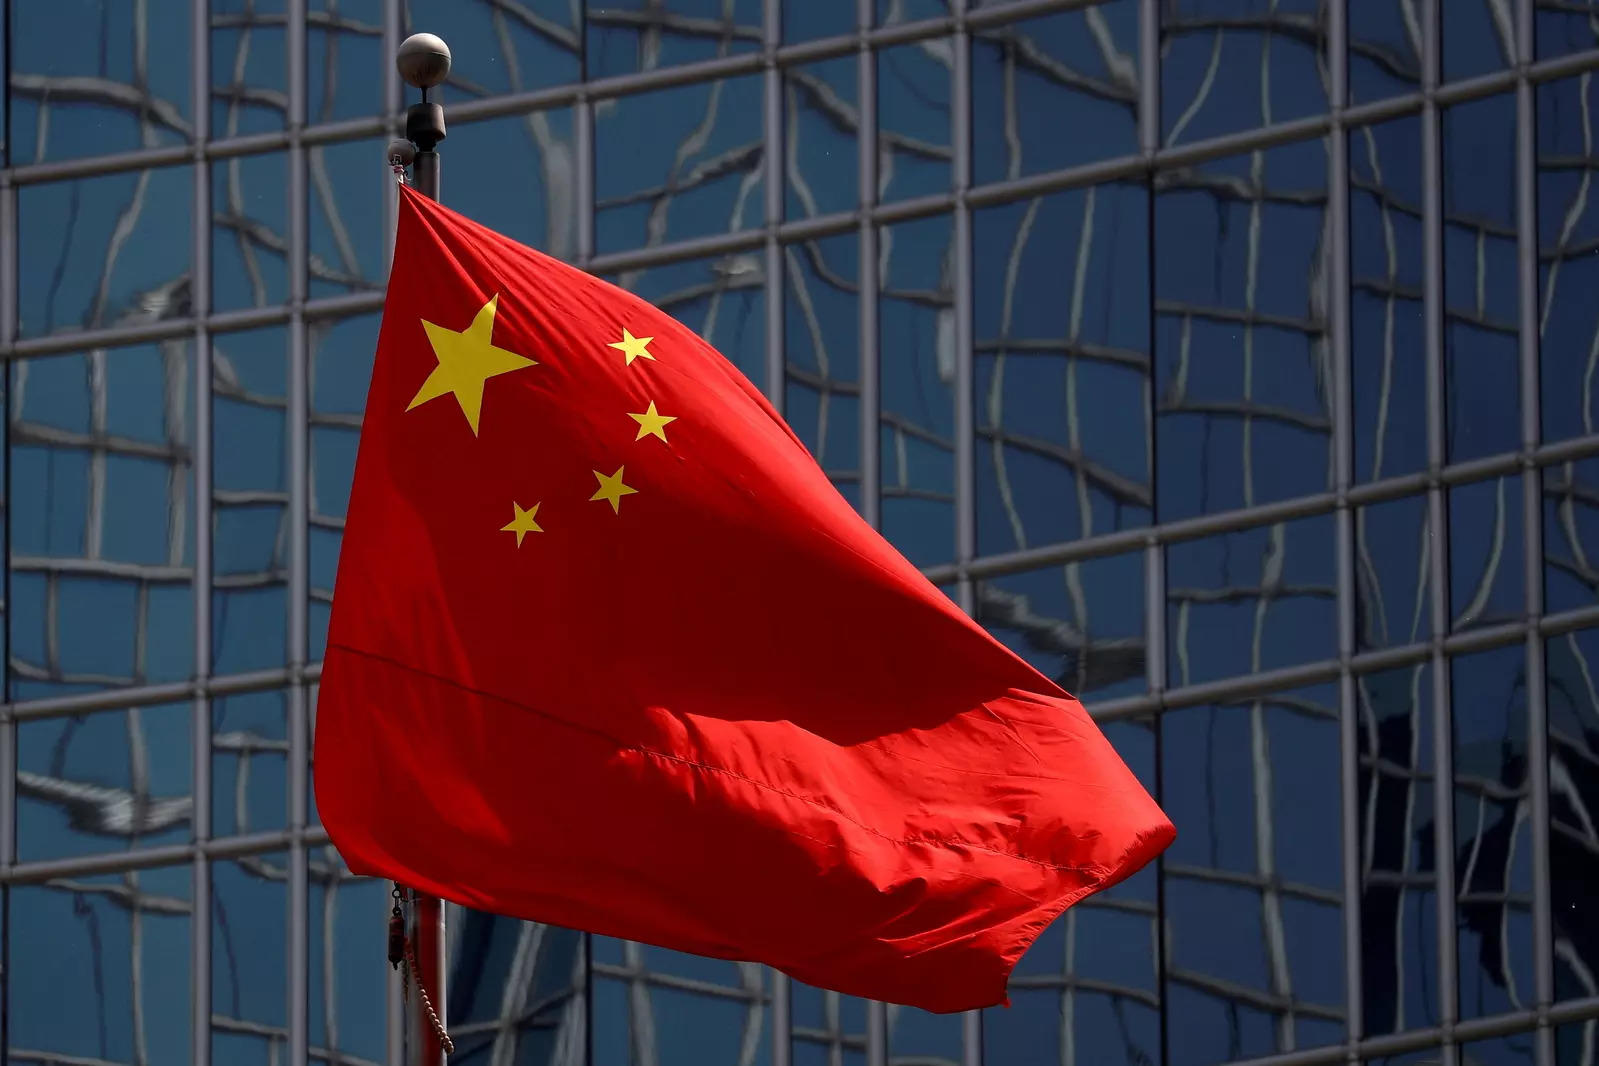 Chinese state media slam medical beauty ads, urge regulation